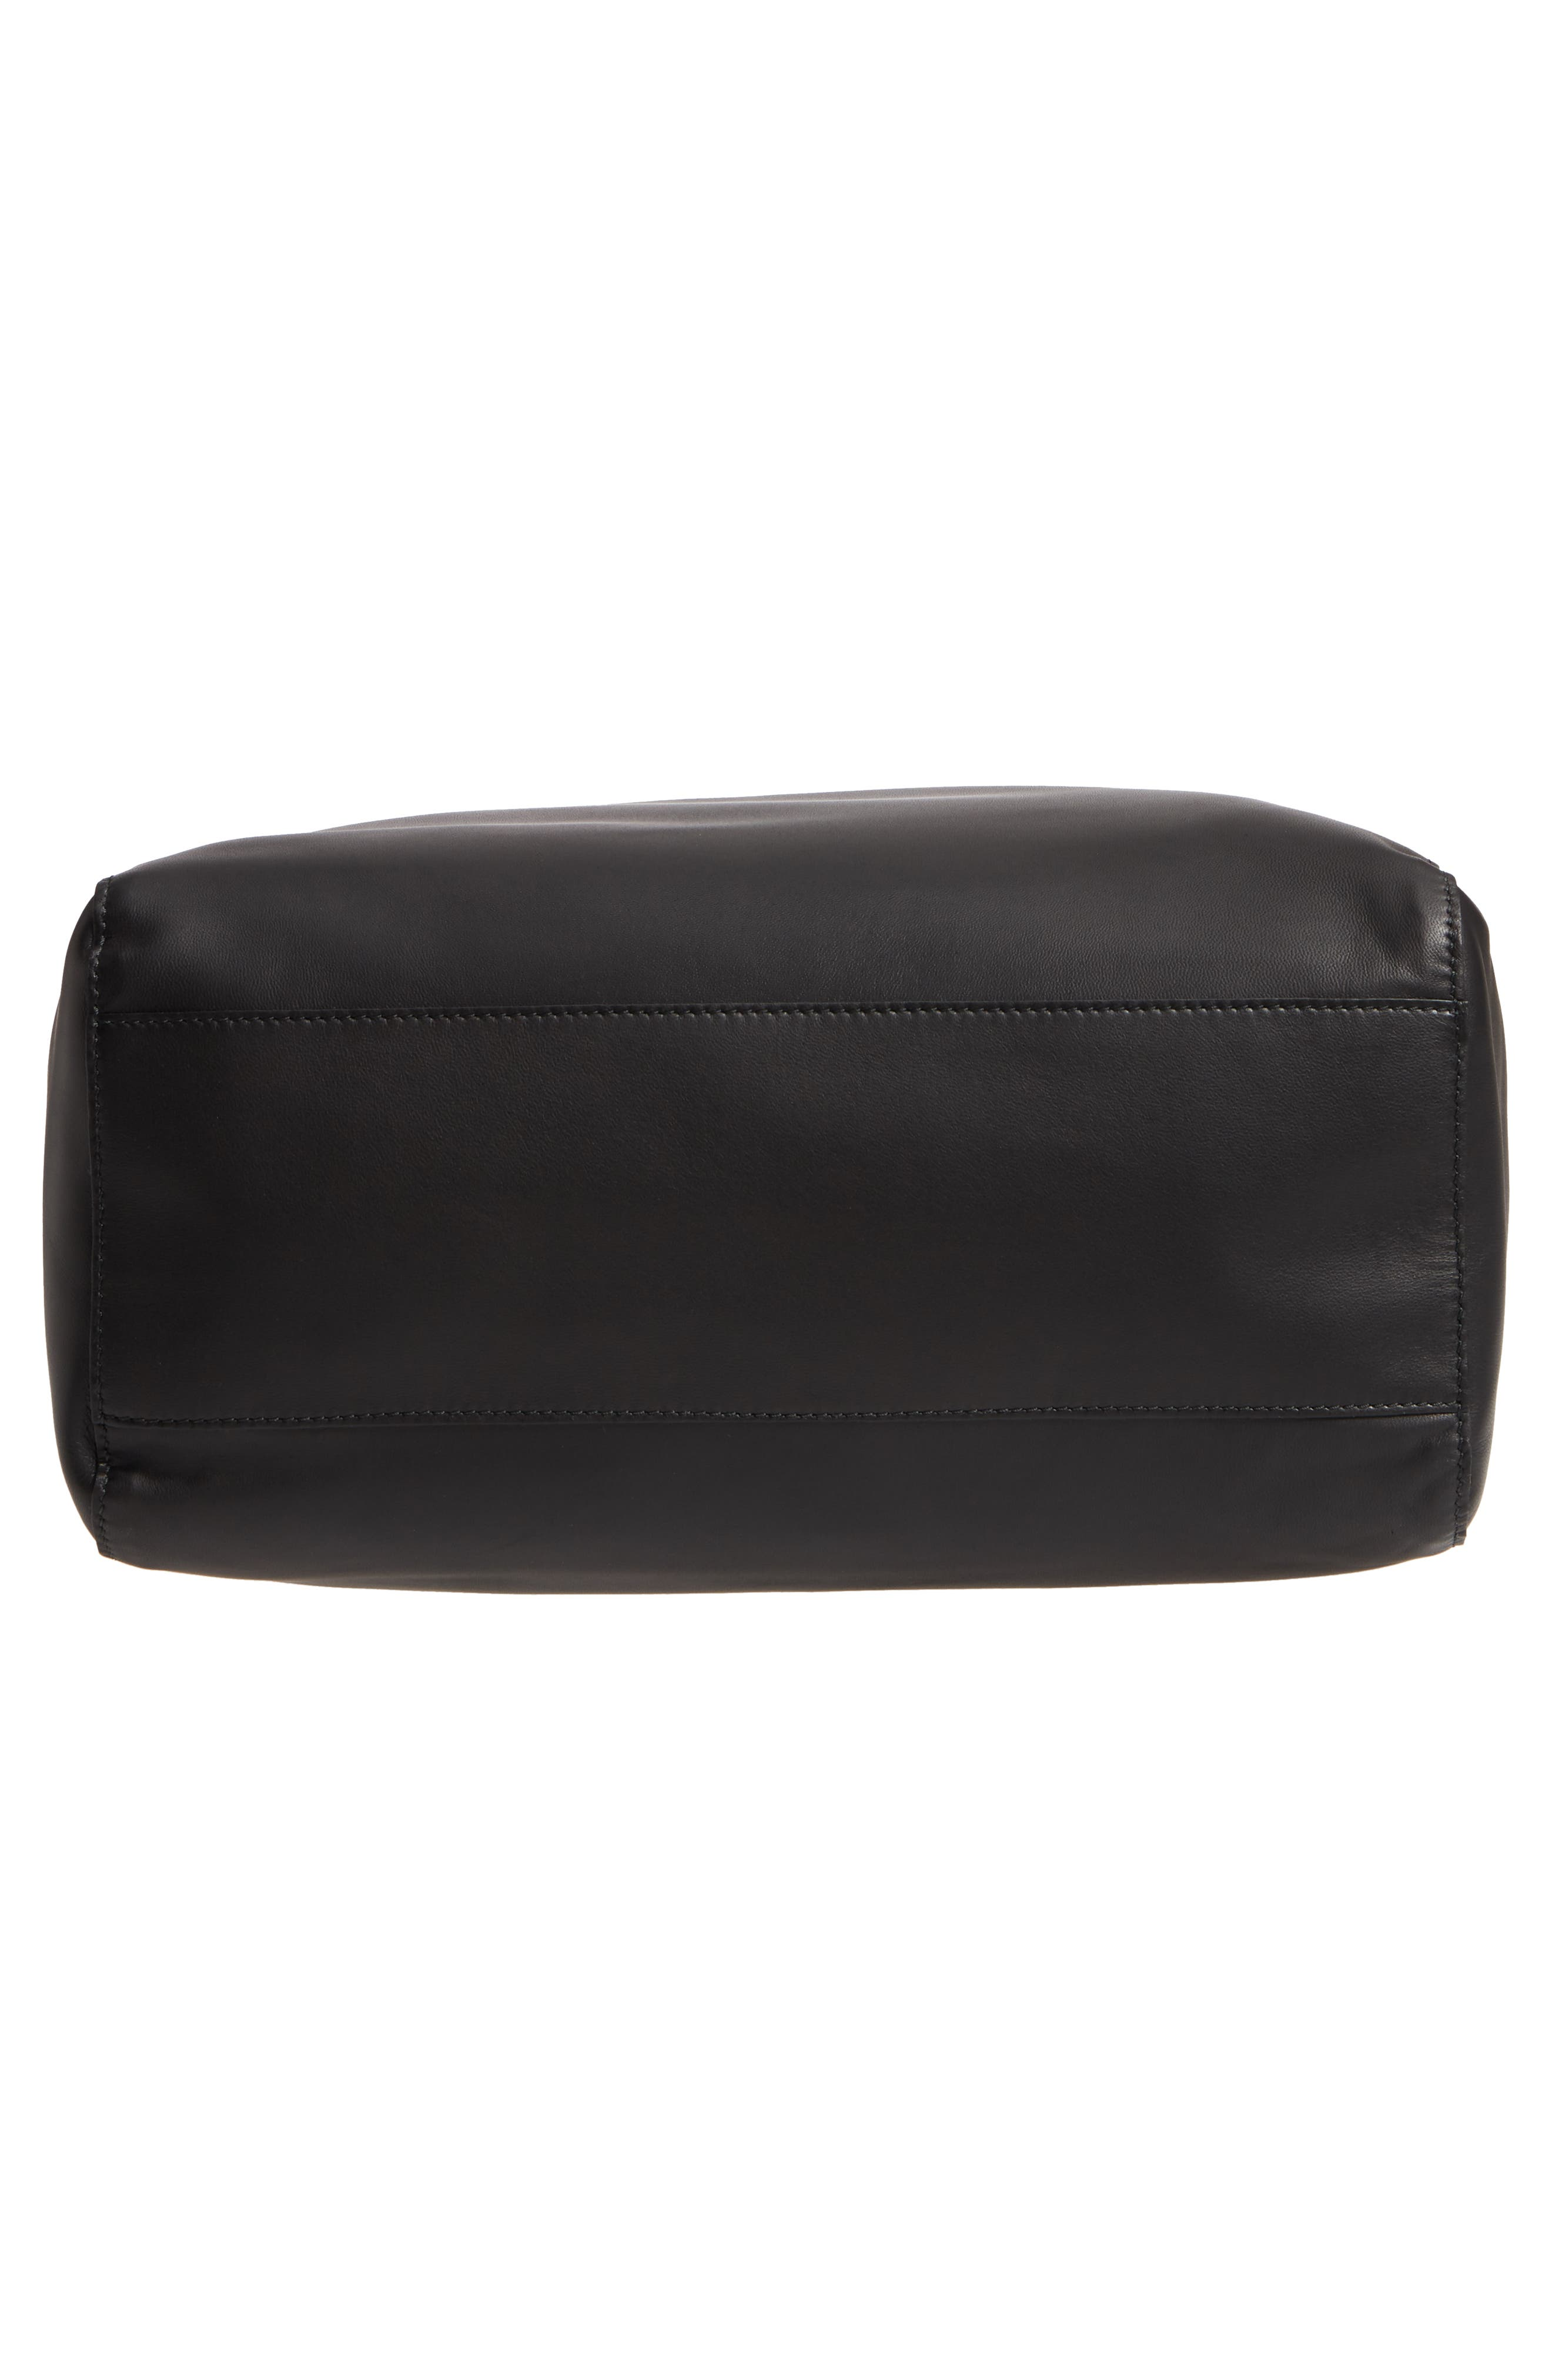 x Andy Warhol Foundation Dennis Hopper Calfskin Leather Bucket Bag,                             Alternate thumbnail 6, color,                             Black/ Red